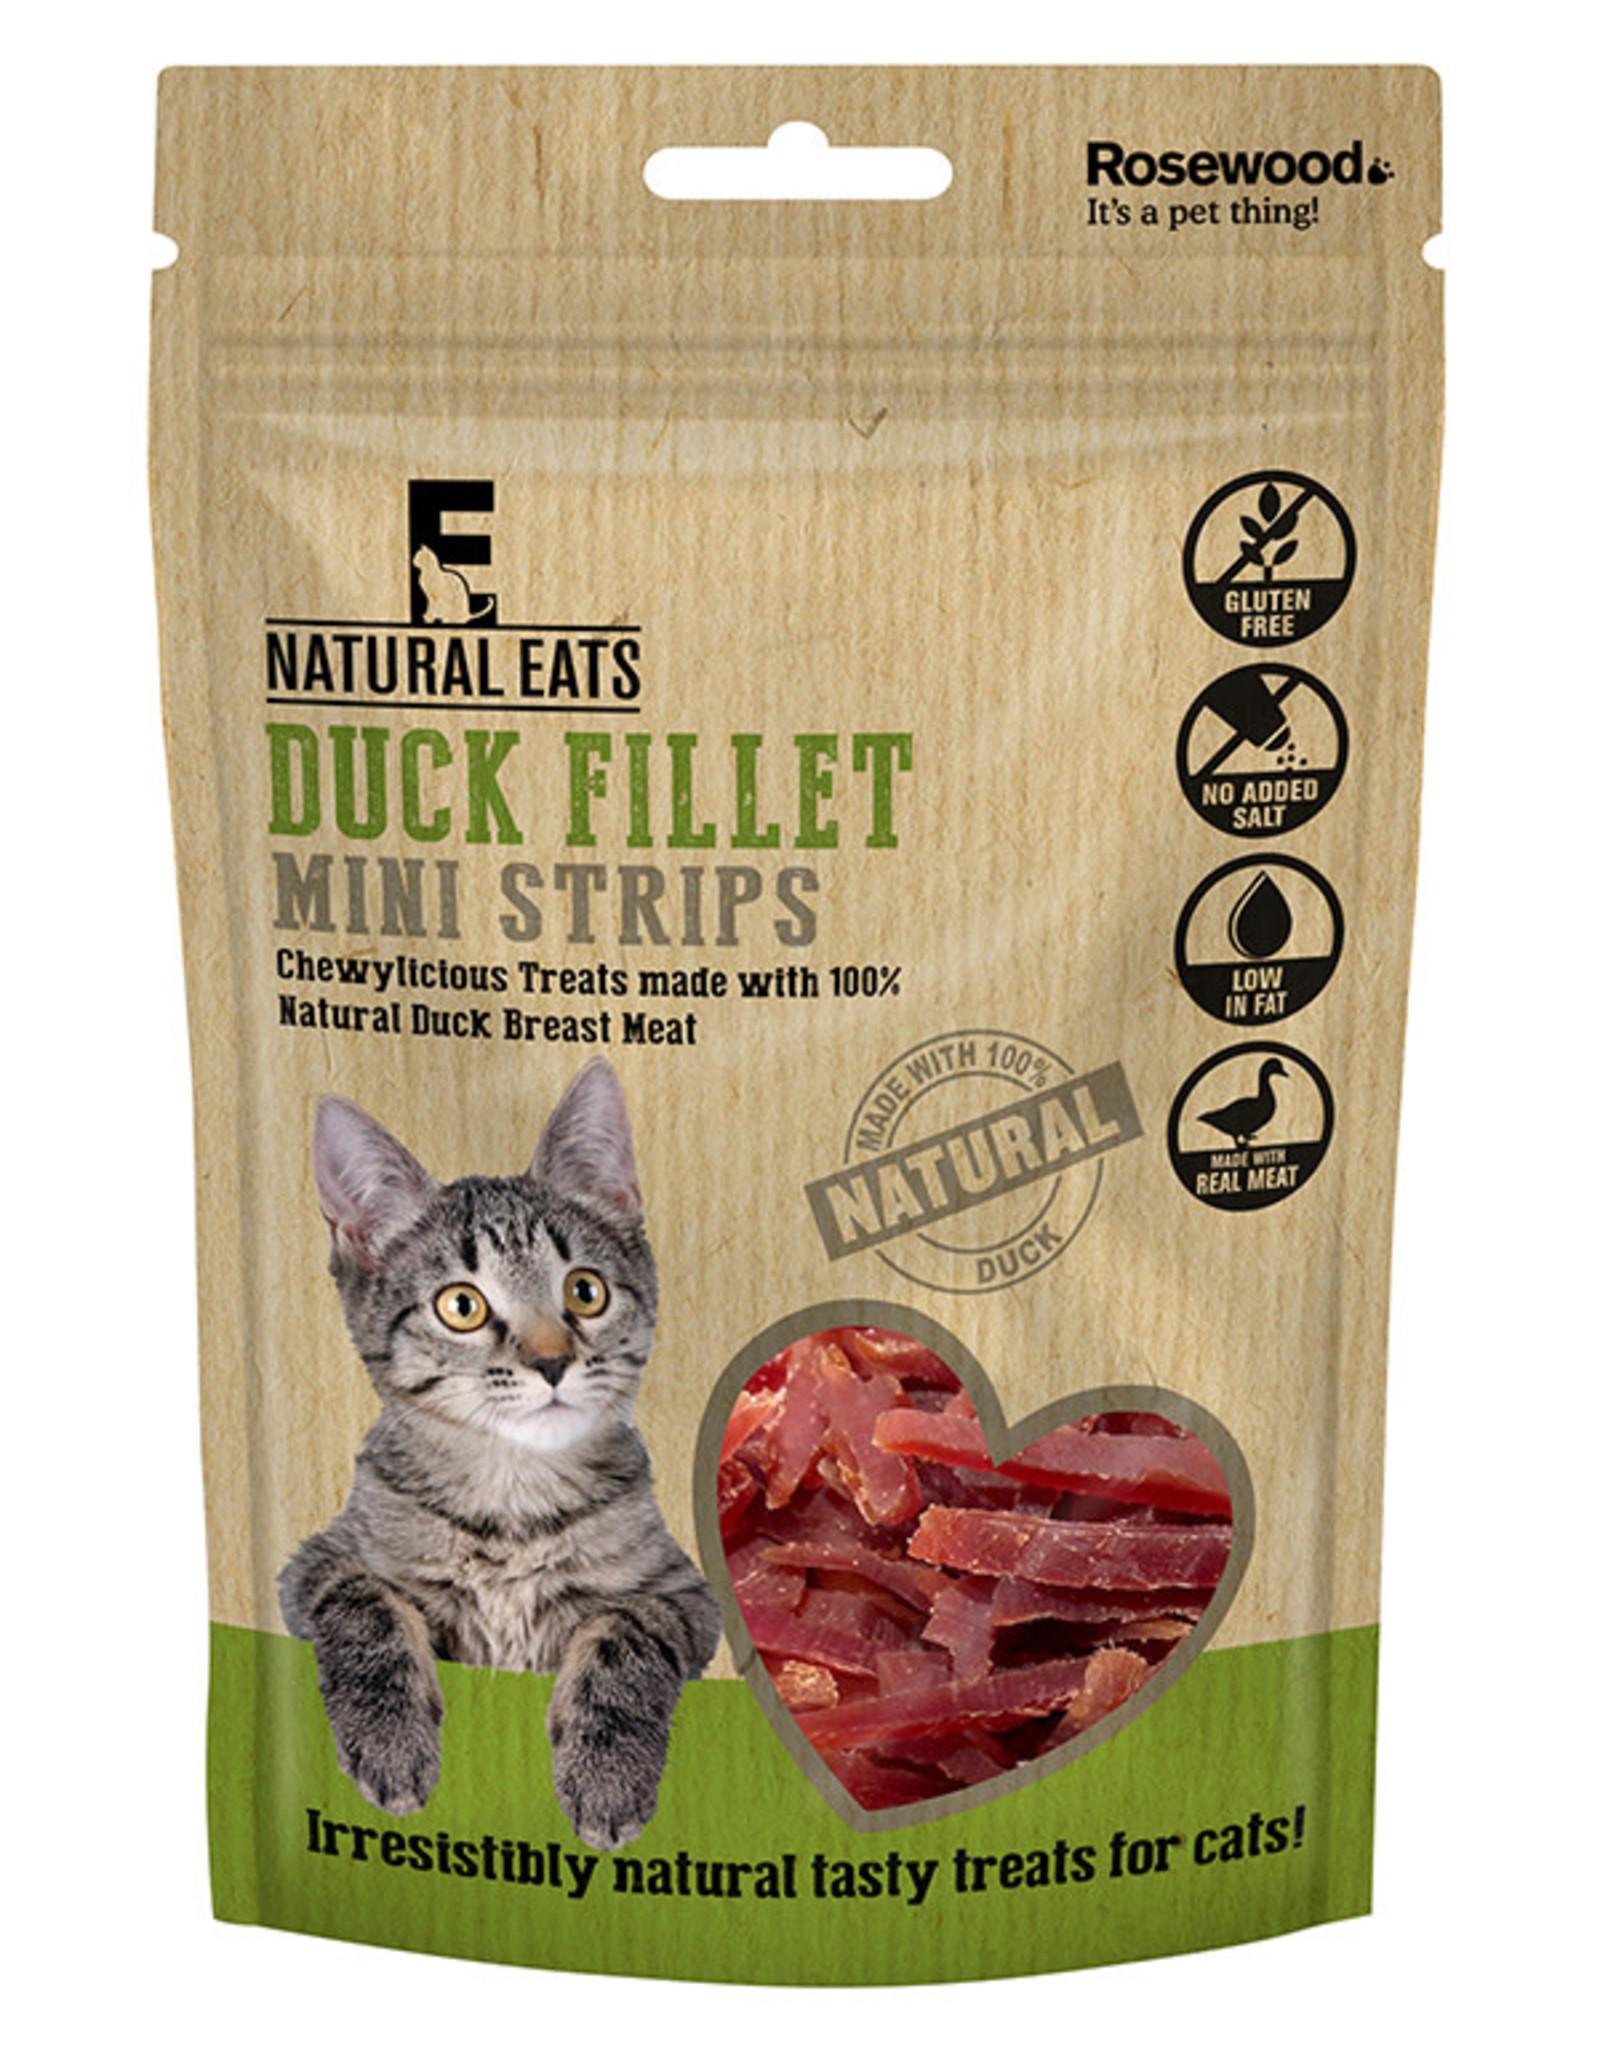 Rosewood Natural Eats Duck Fillet Mini Strips Cat Treats, 50g